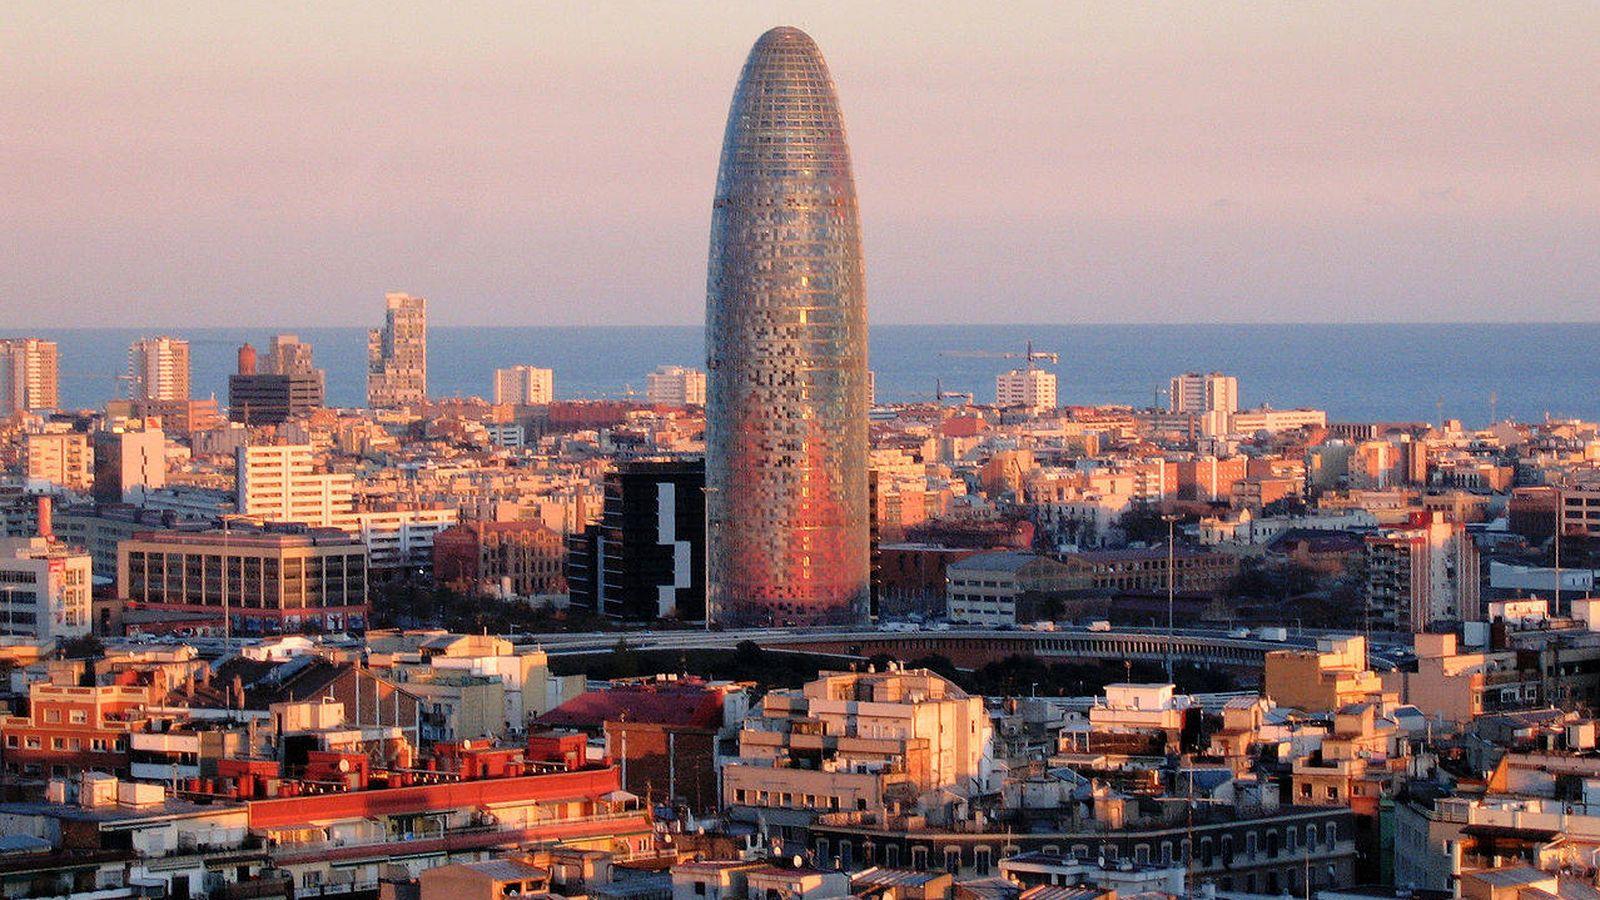 Torre Agbar: Merlin da un portazo a la oferta fake de Buffett: la torre Agbar no está en venta